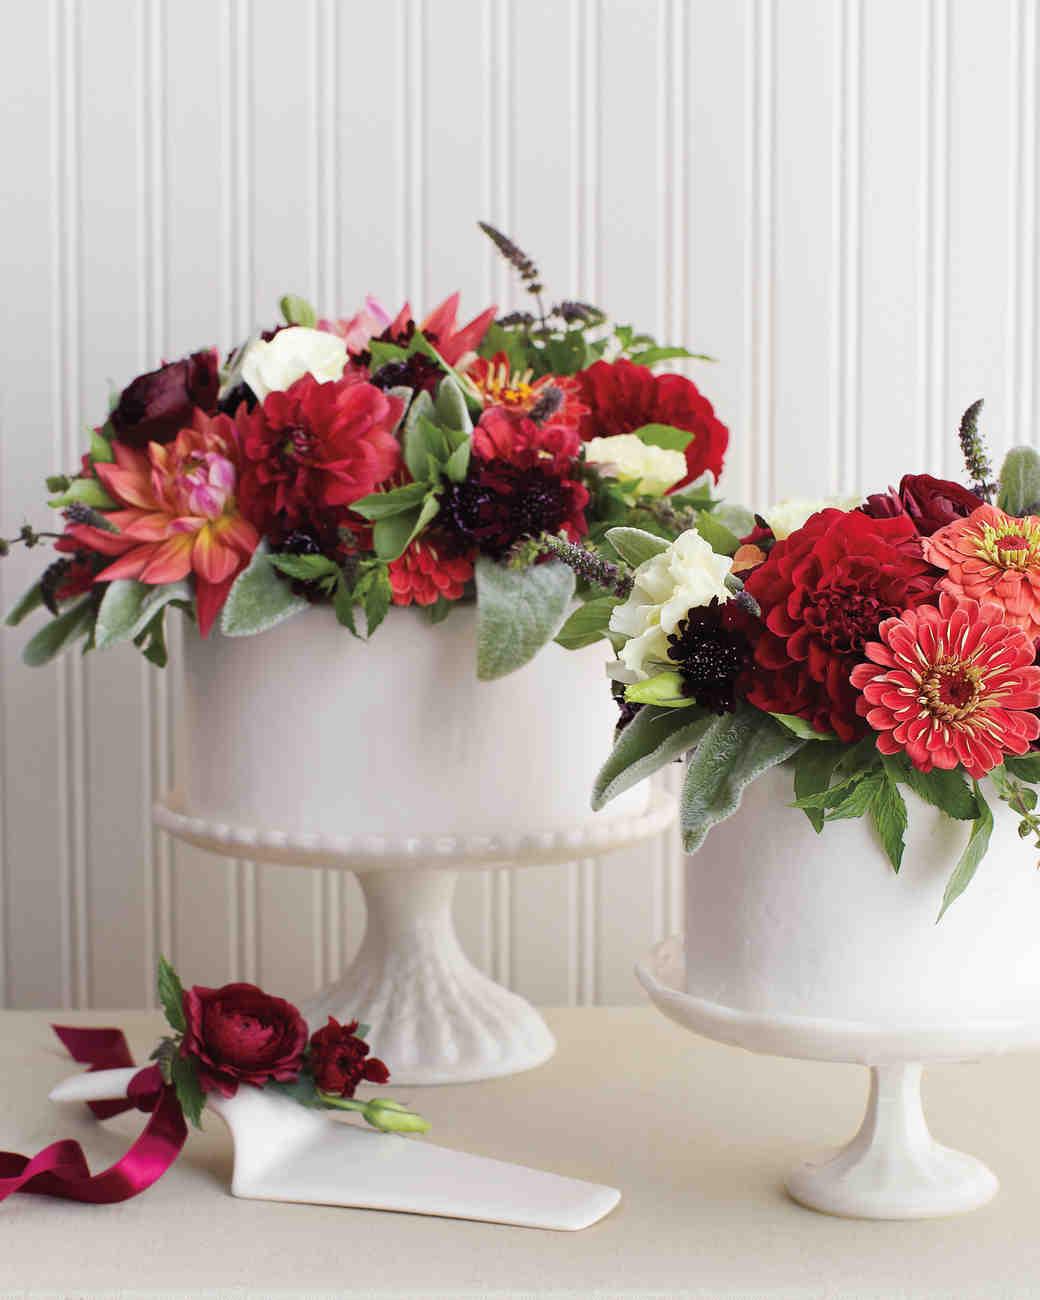 flower-cakes-061-mwd110589.jpg